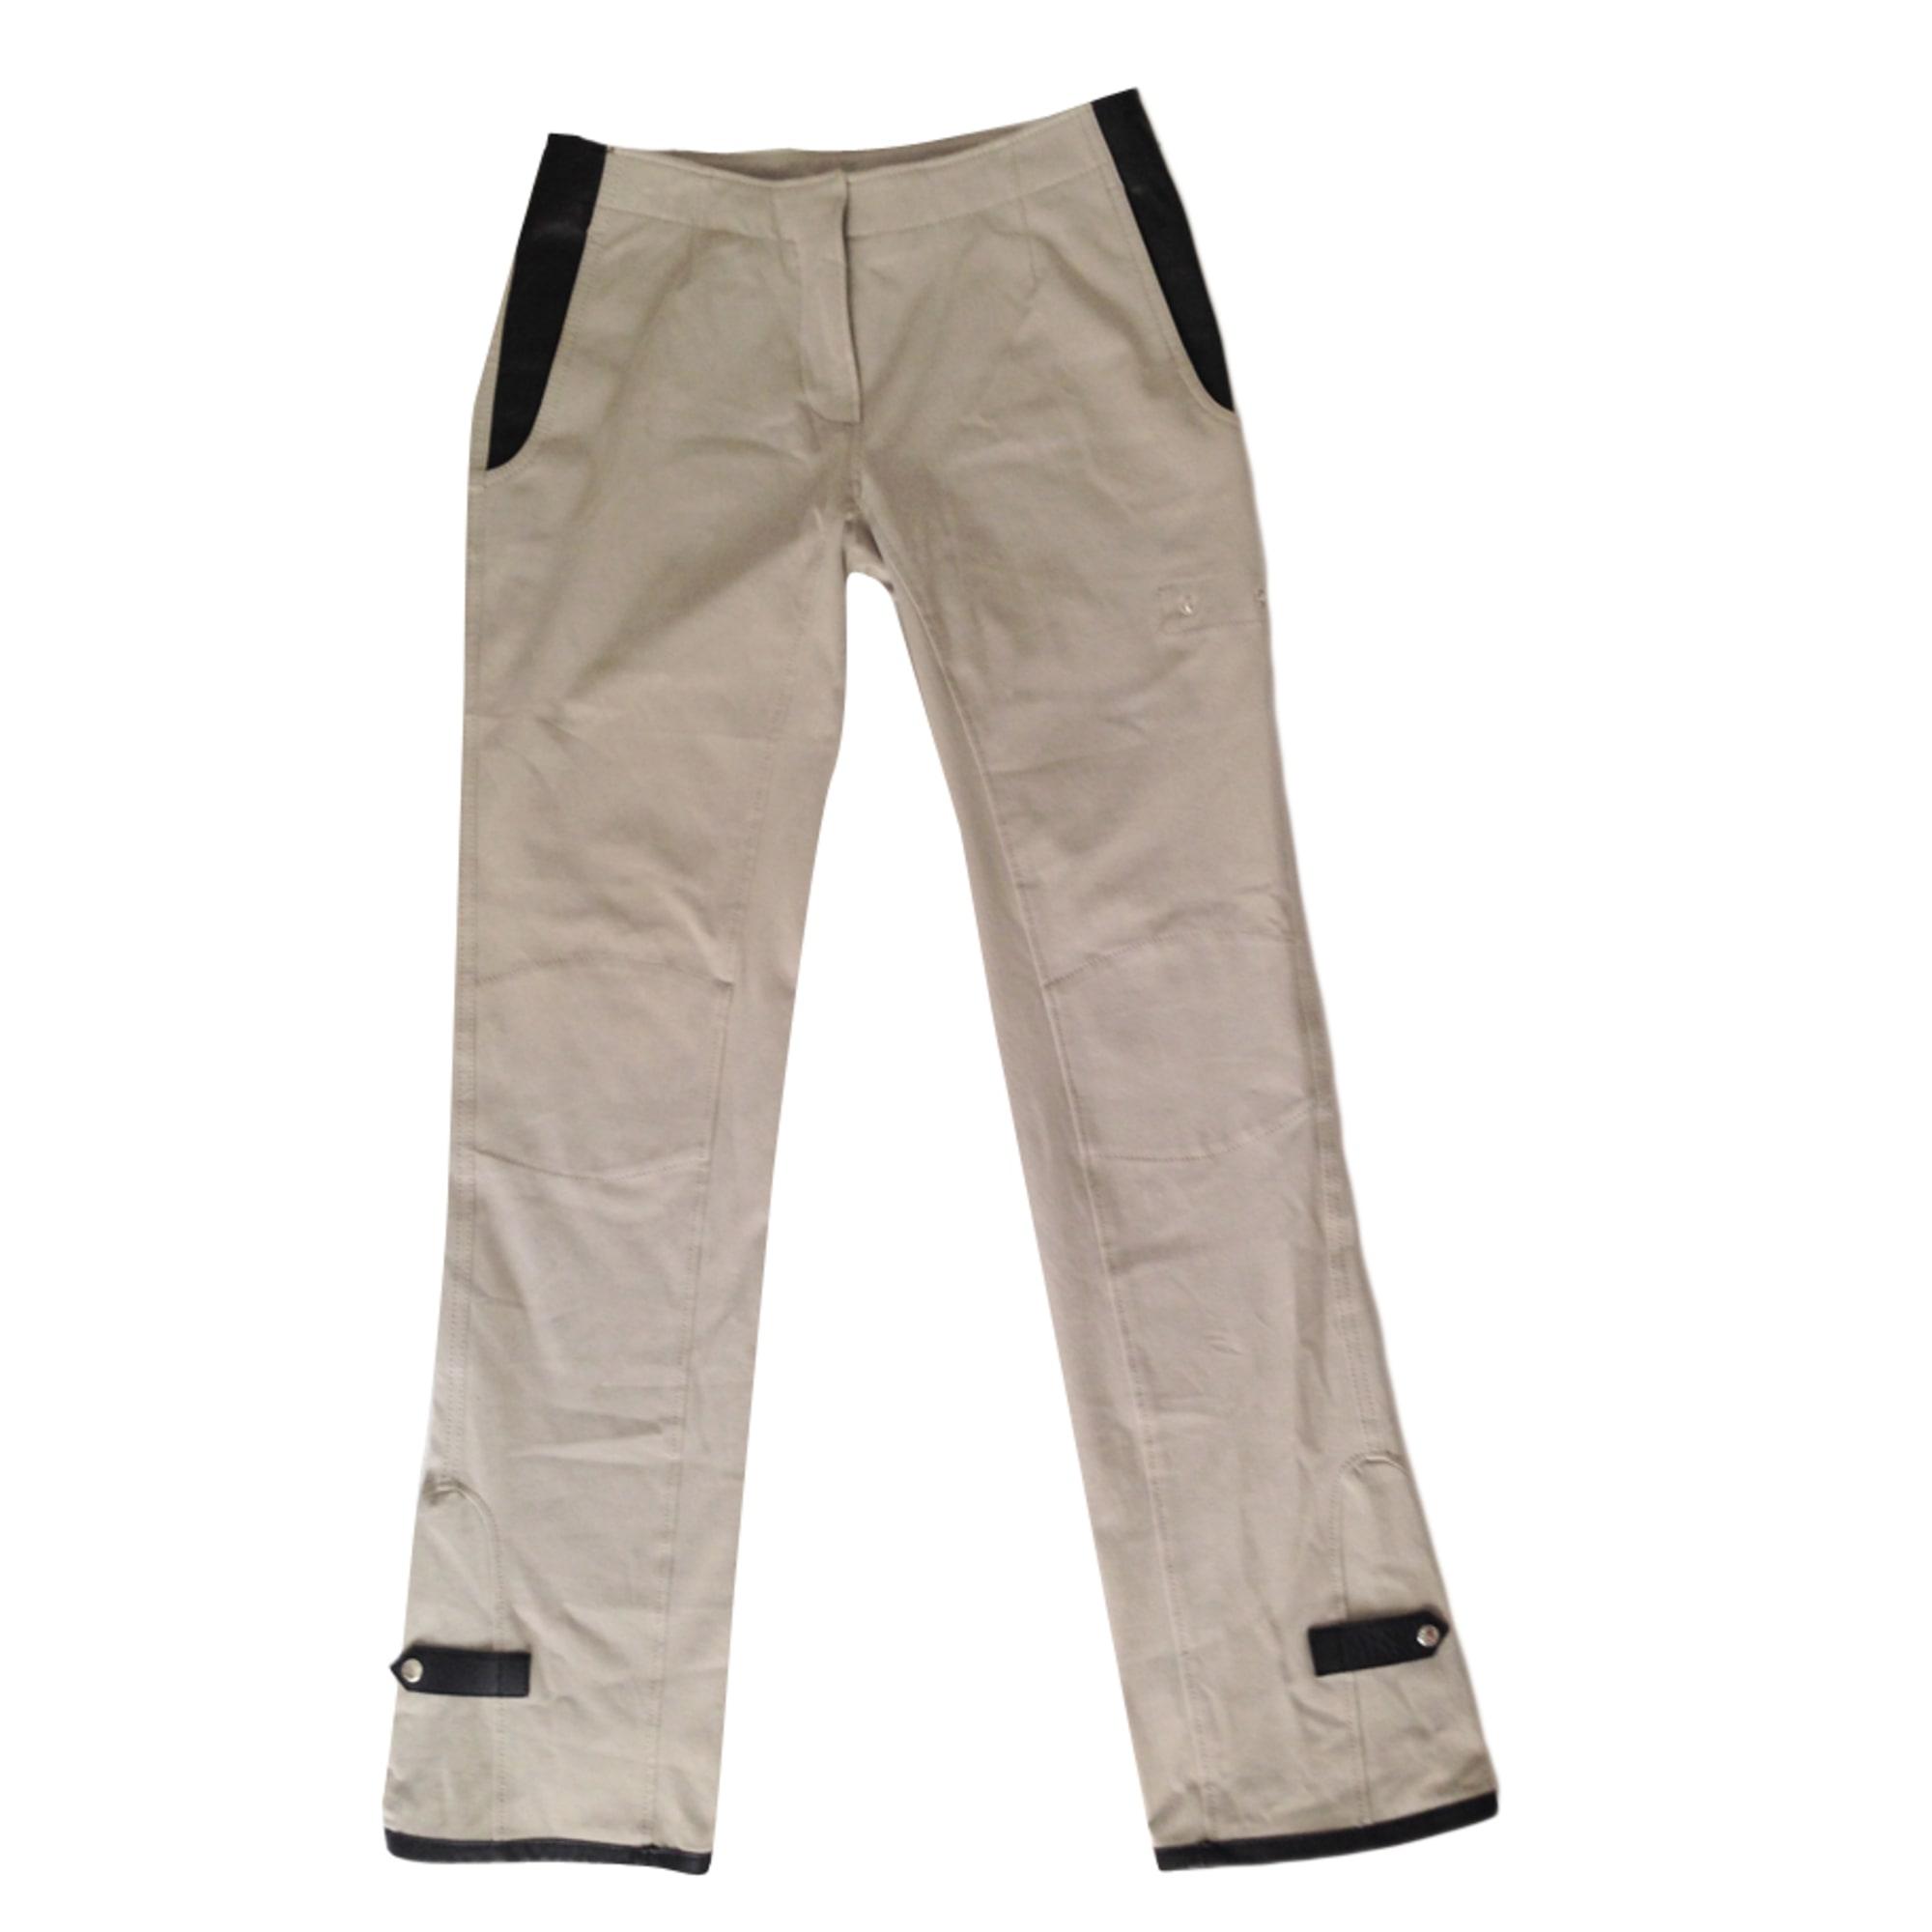 Pantalon droit PRADA Beige, camel